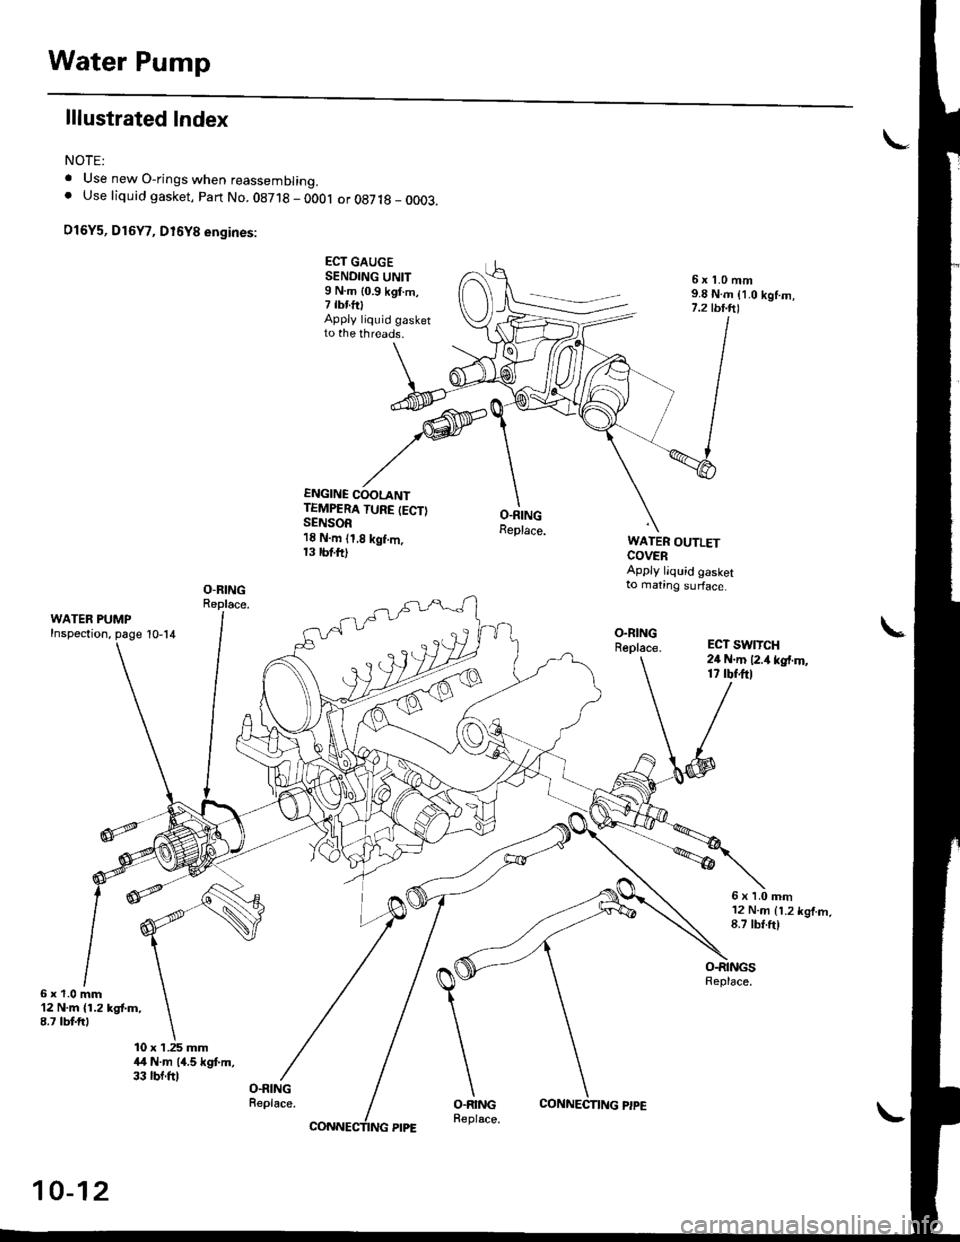 Engine Coolant Honda Civic 1997 6g Workshop Manual Wiring Library Change